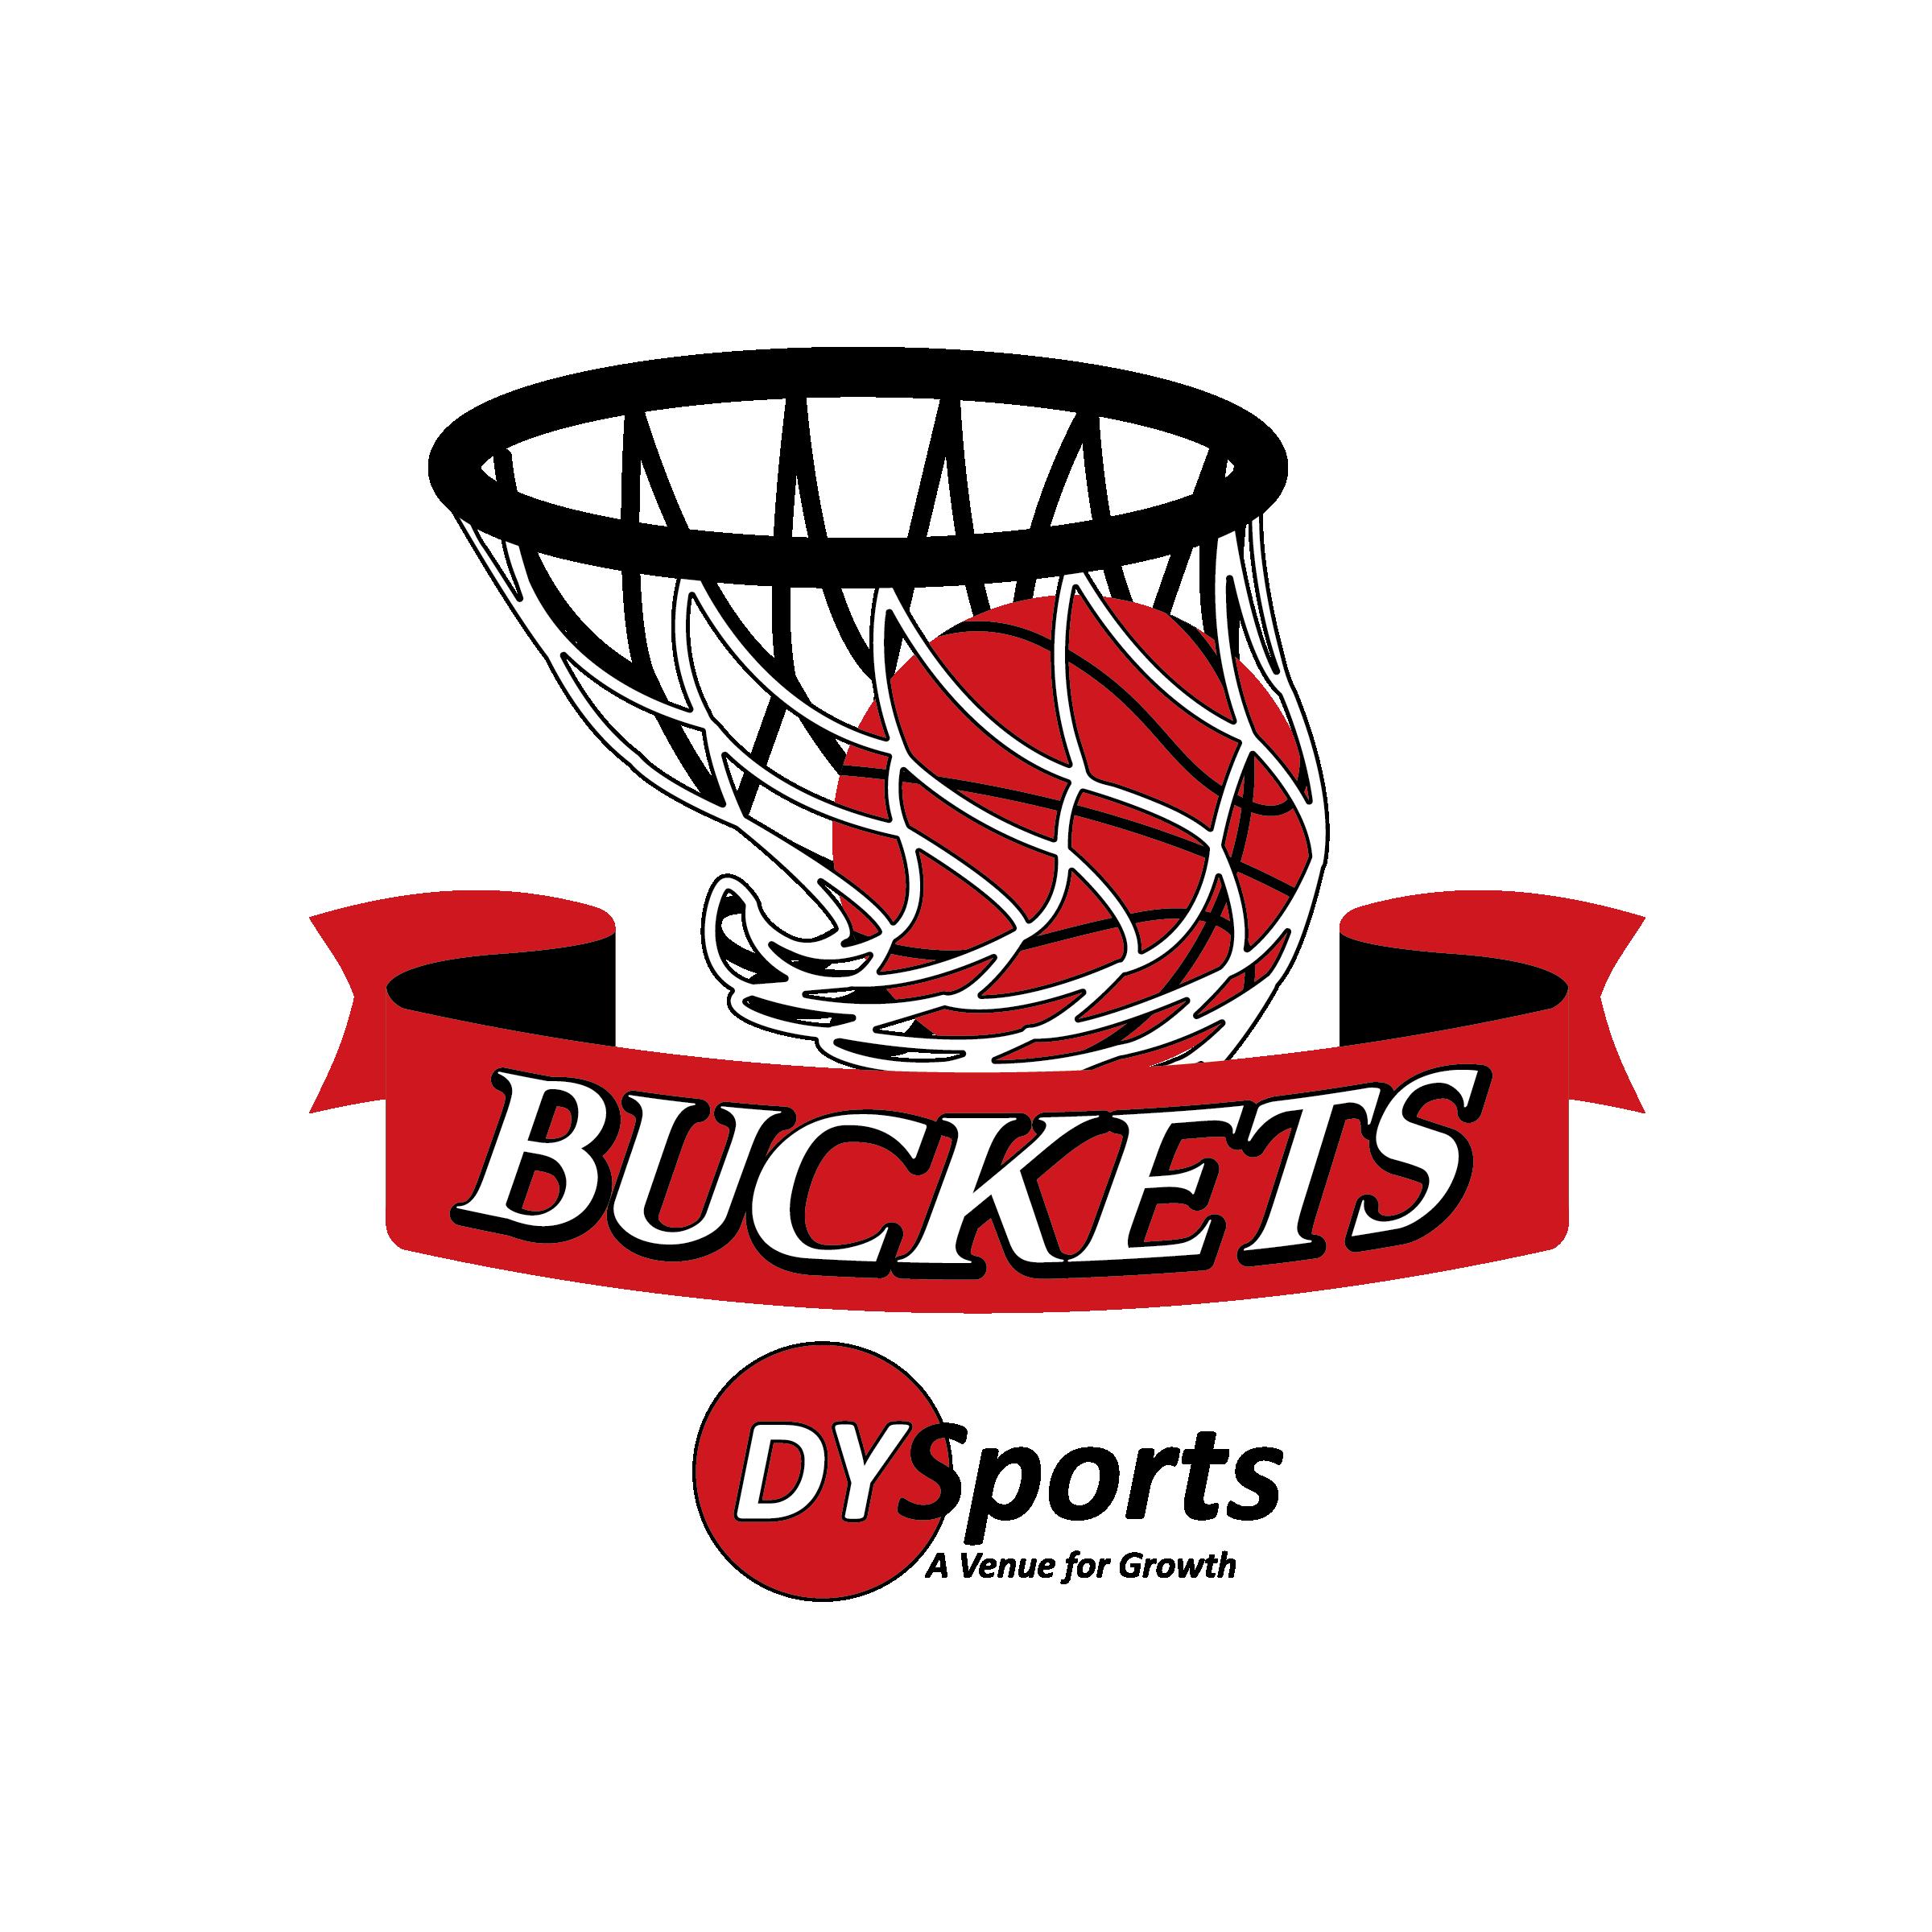 Buckets - - October 5th and 6th- Ballard High School- 4 games guaranteed- Registration ends Sunday, September 29th